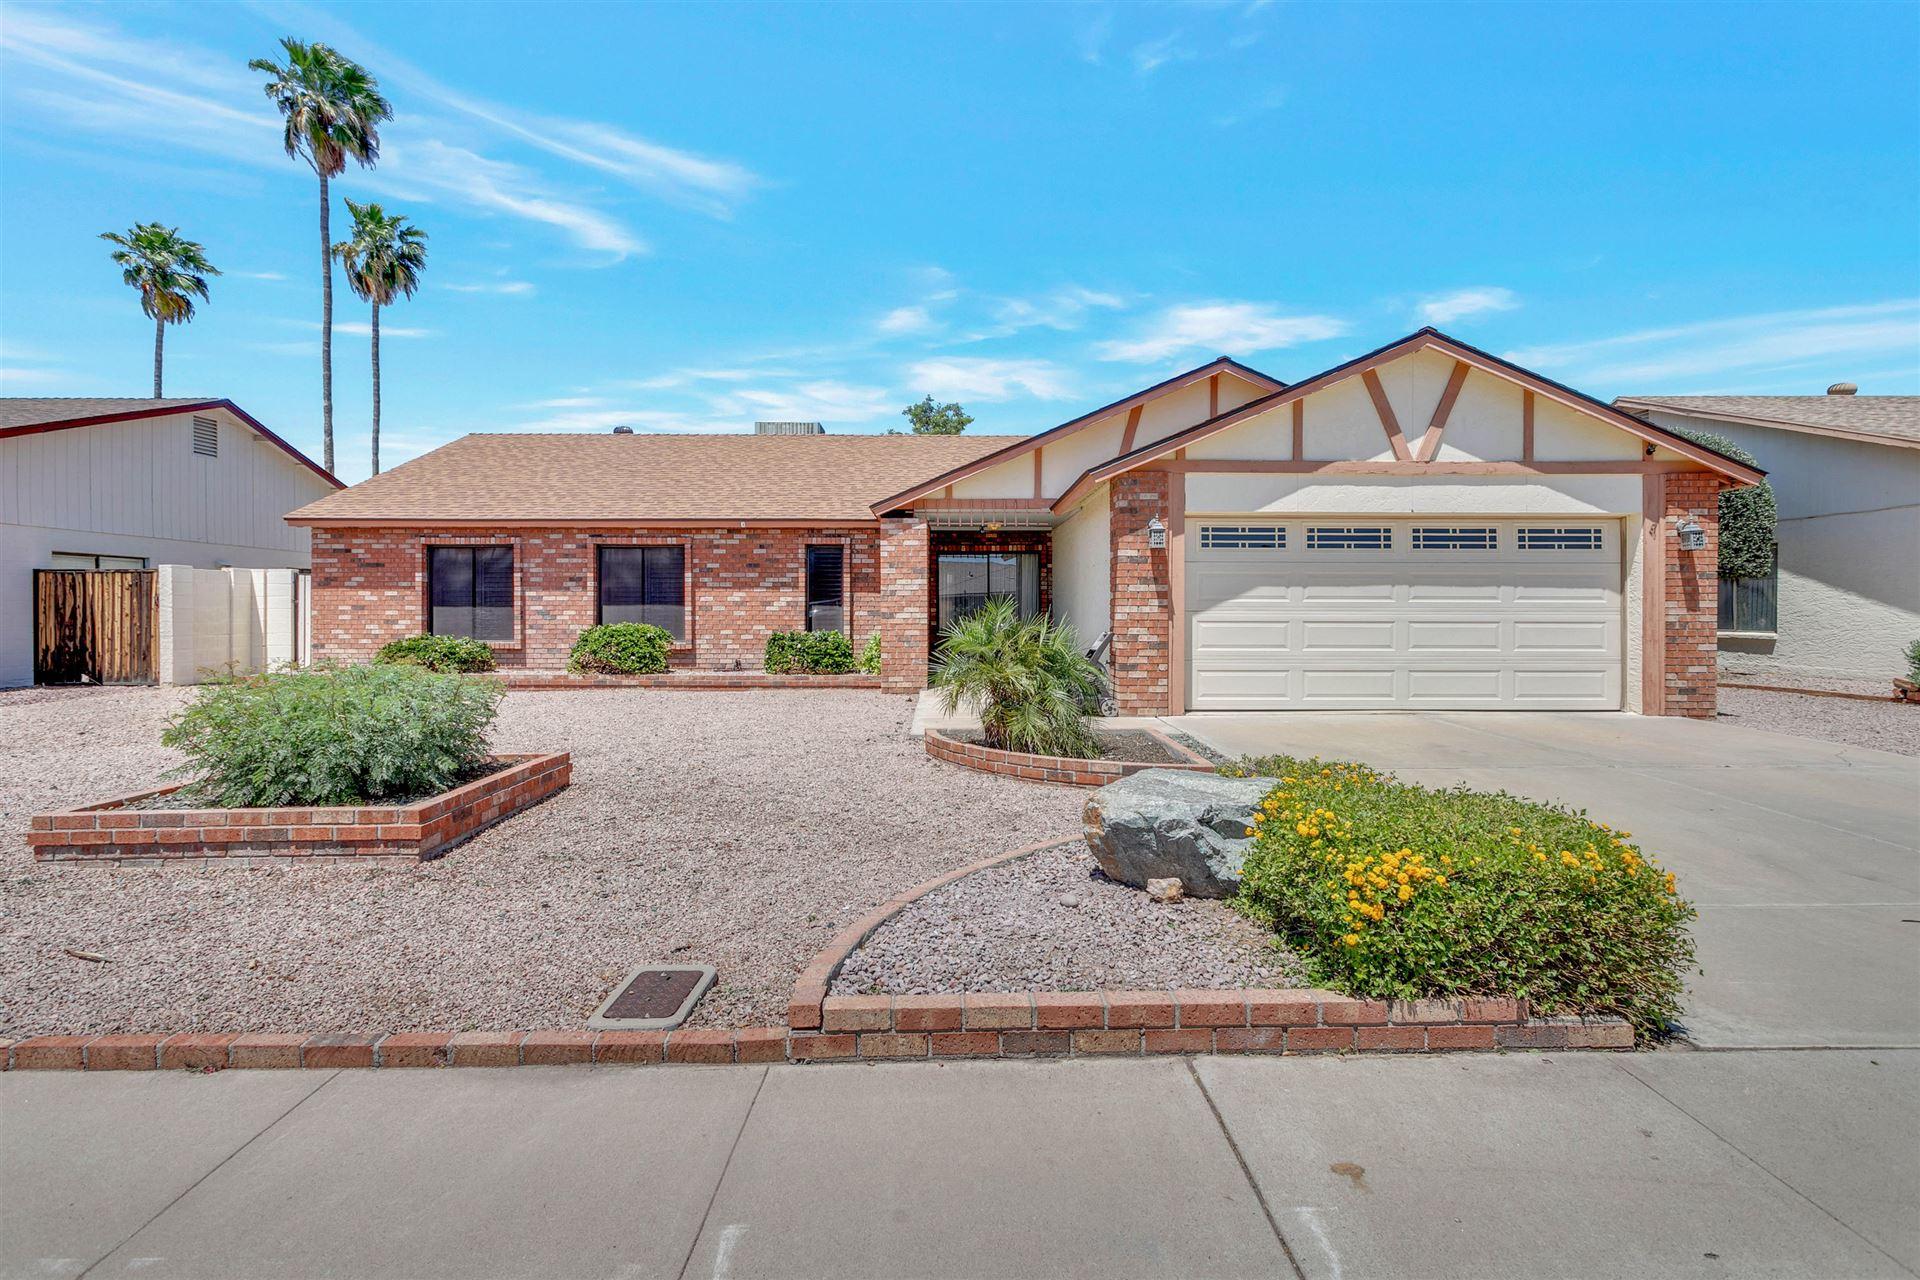 Photo of 5514 W Beryl Avenue, Glendale, AZ 85302 (MLS # 6232515)